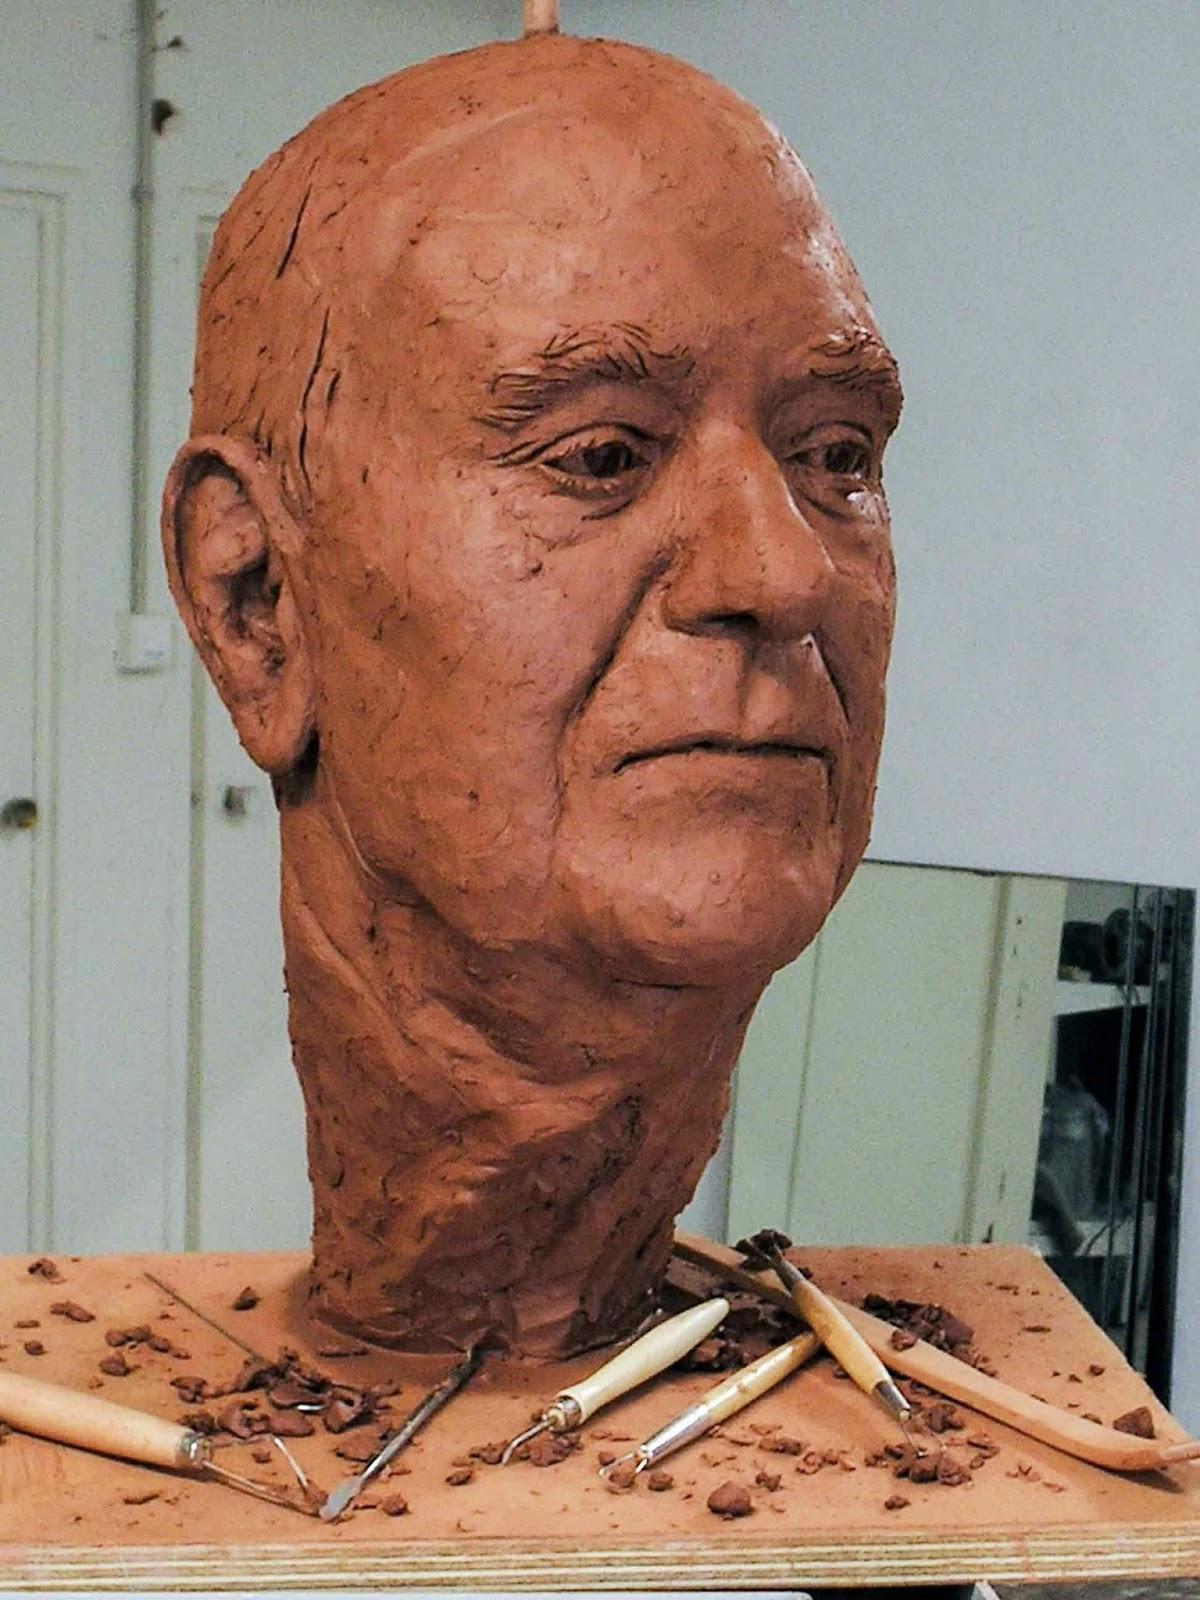 Monumento bronce Fuente Álamo Murcia Arturo Serra escultura 7